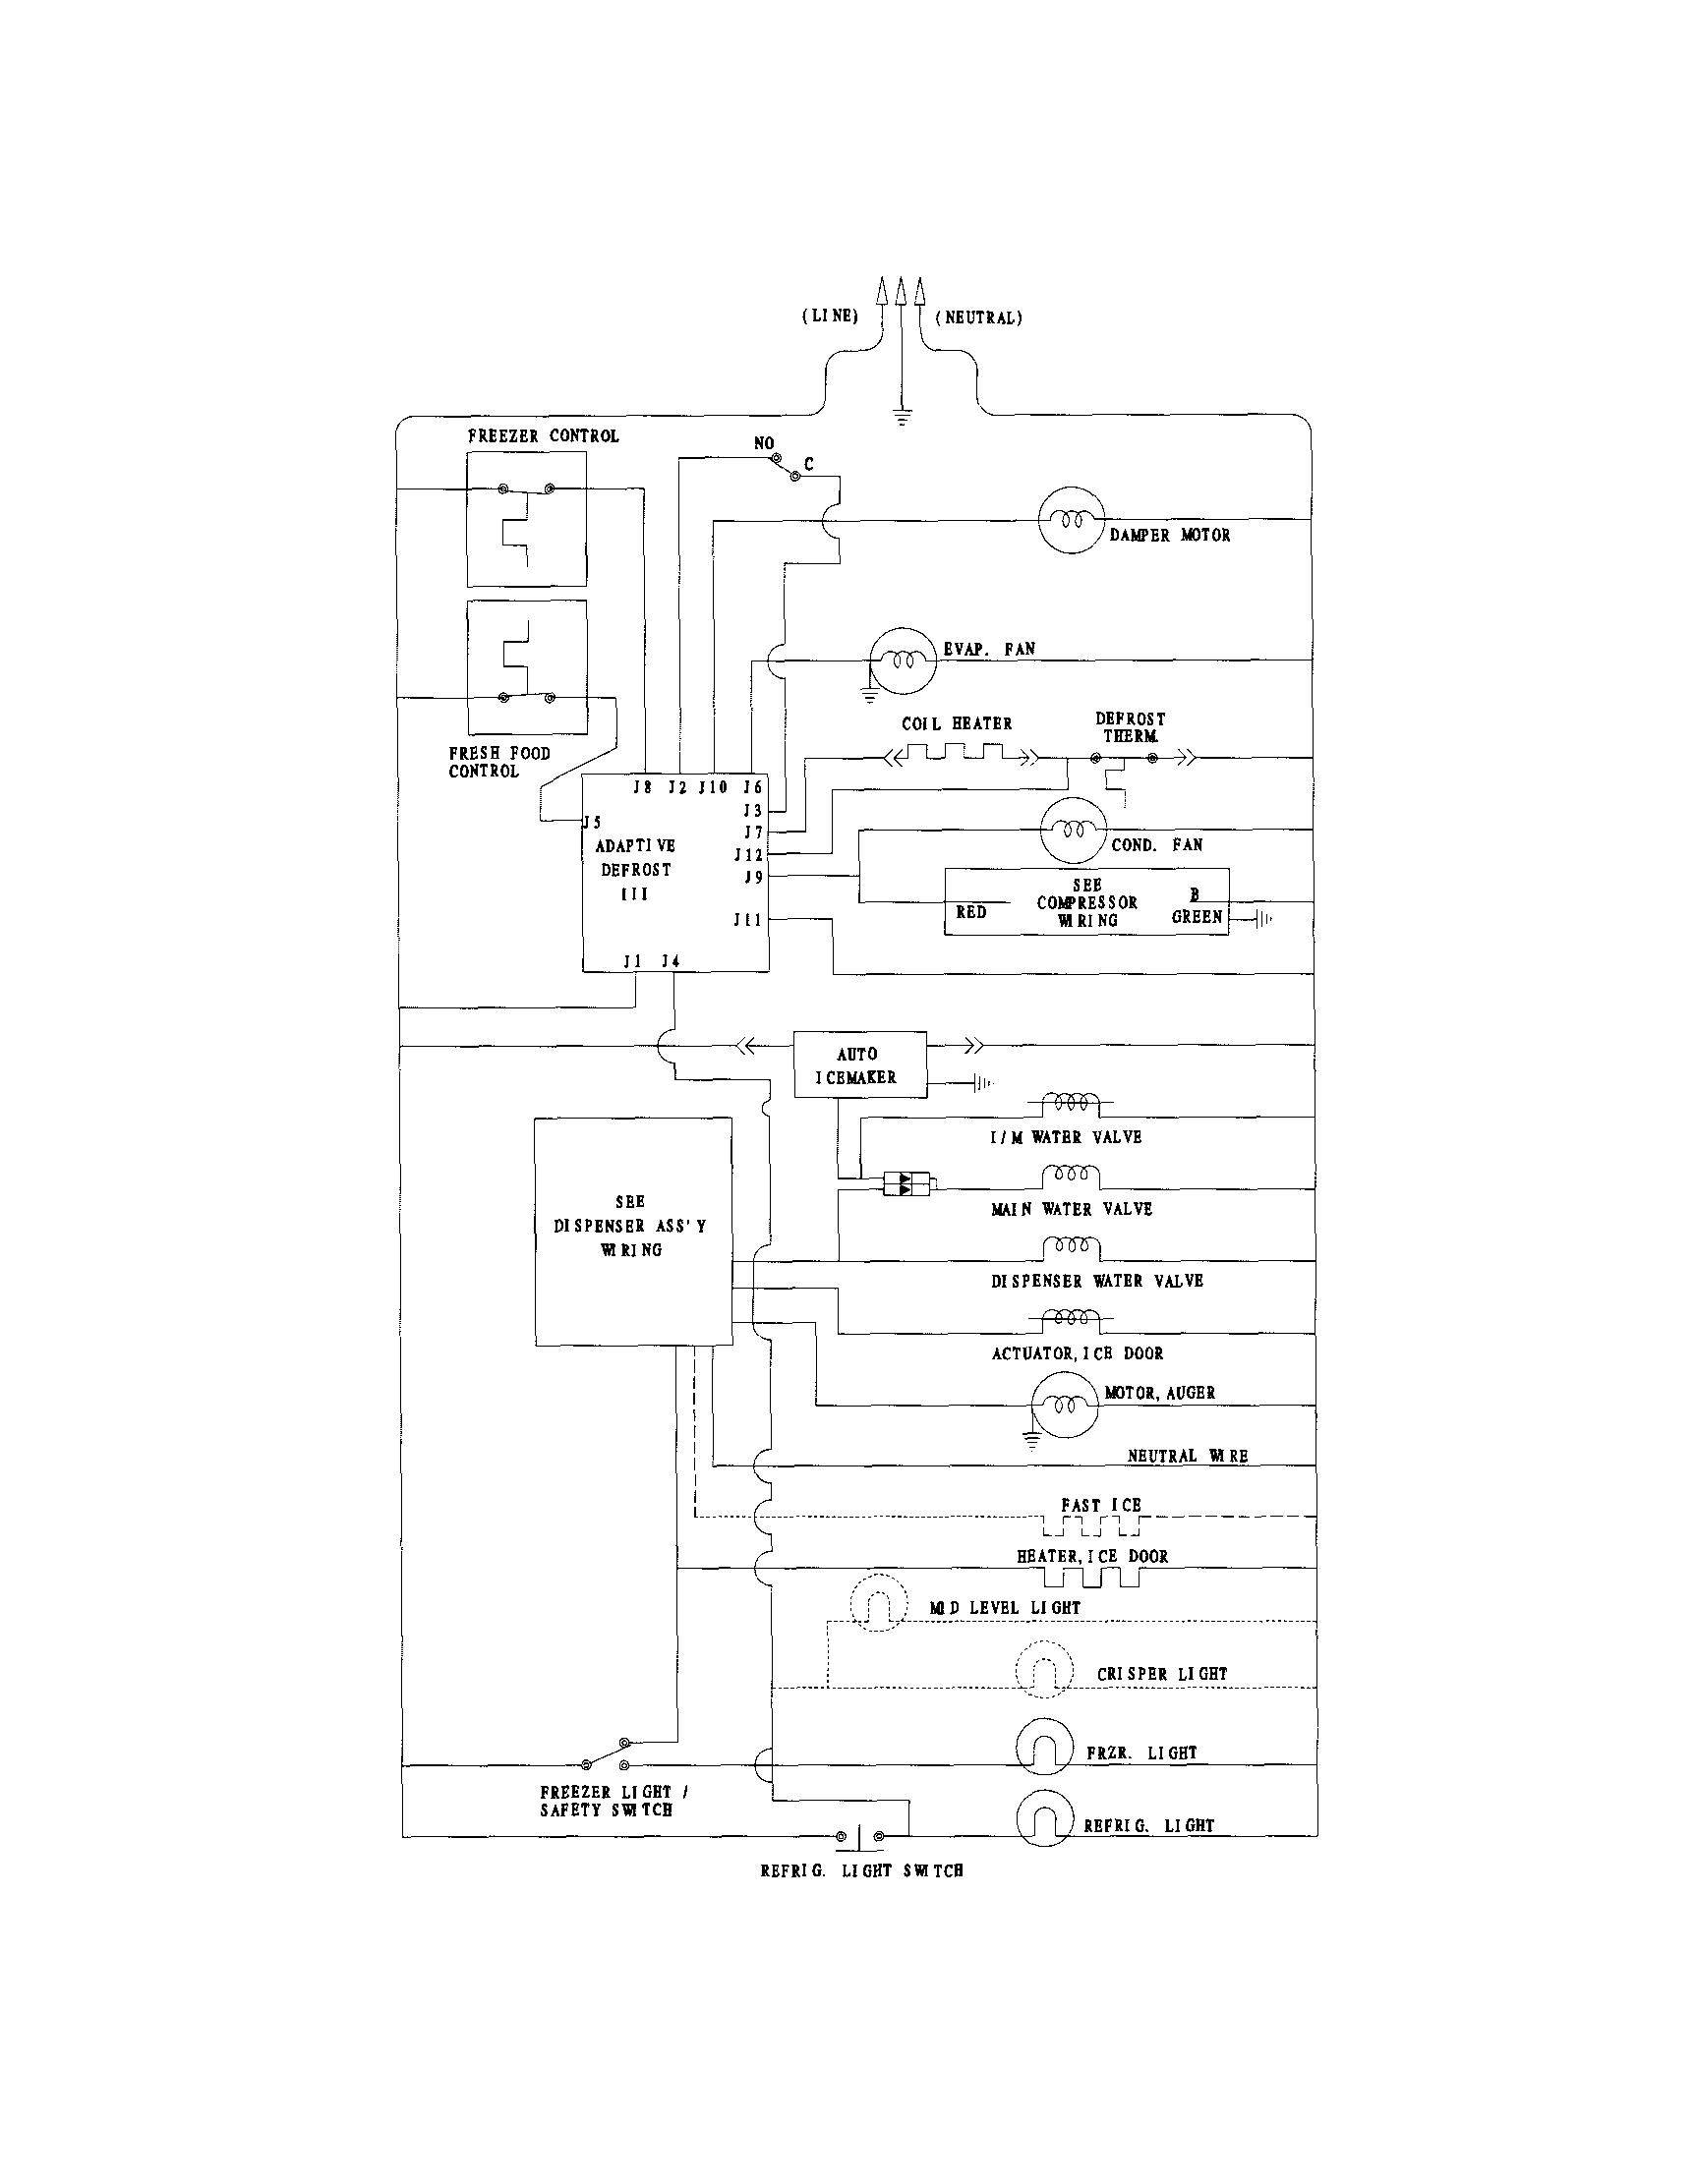 Frigidaire refrigerator parts model frs26kf6emb sears partsdirect